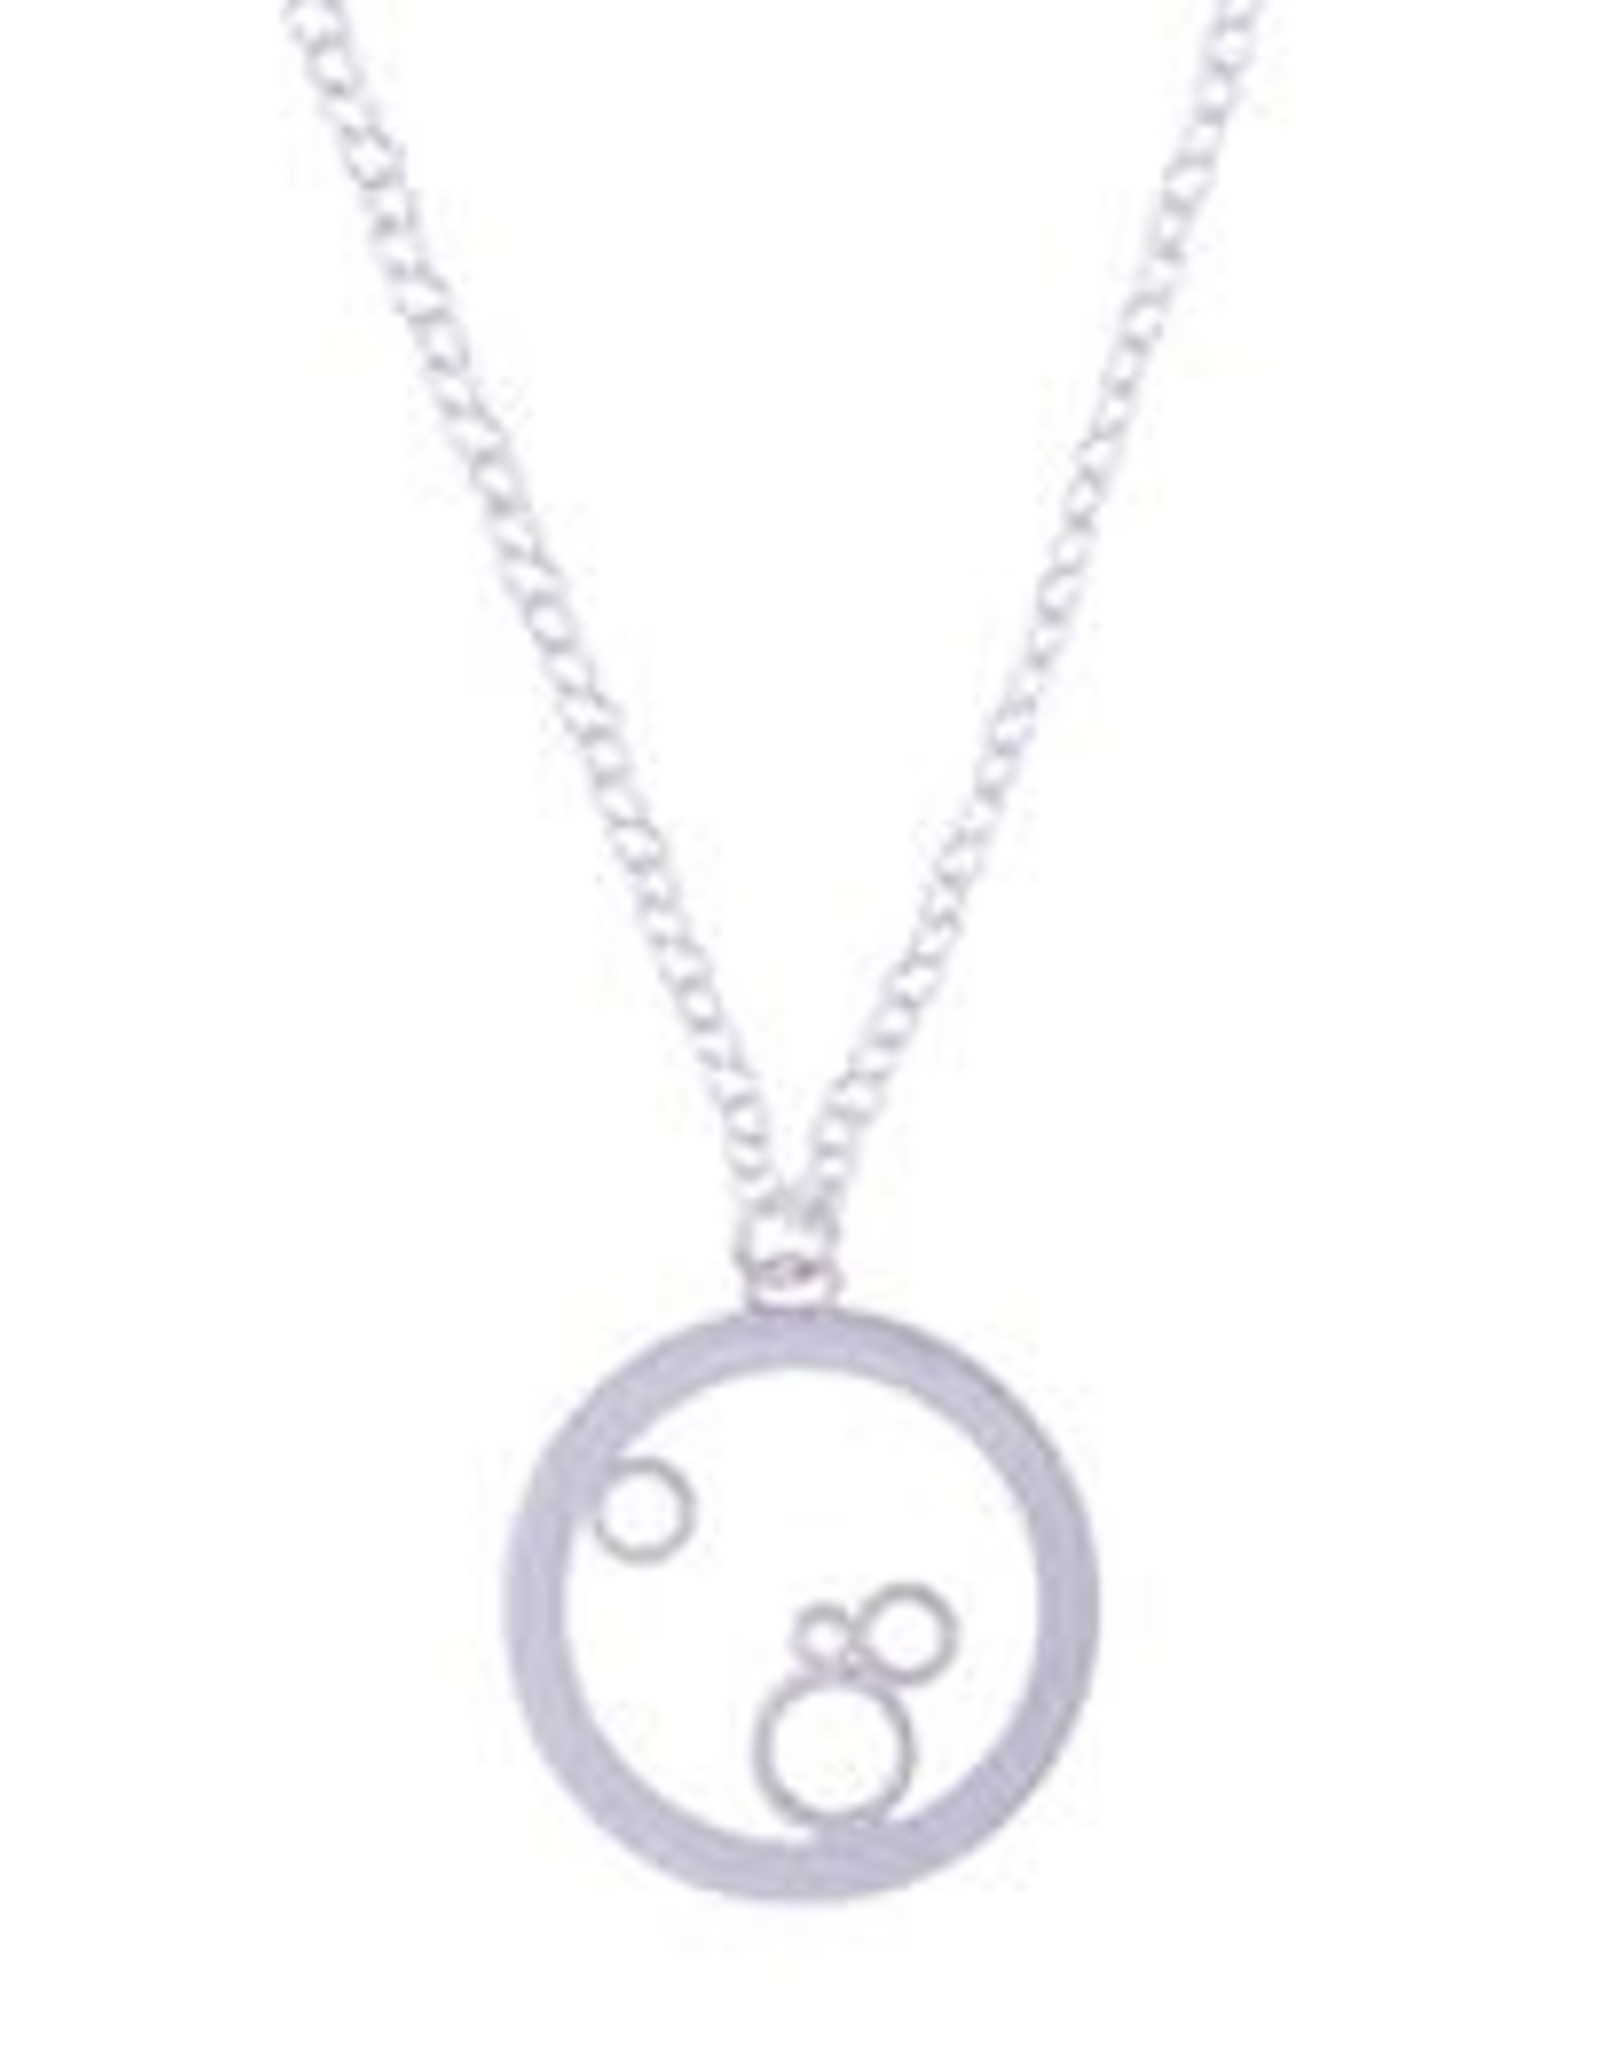 Ariane Tobin AT005 Halo small pendant